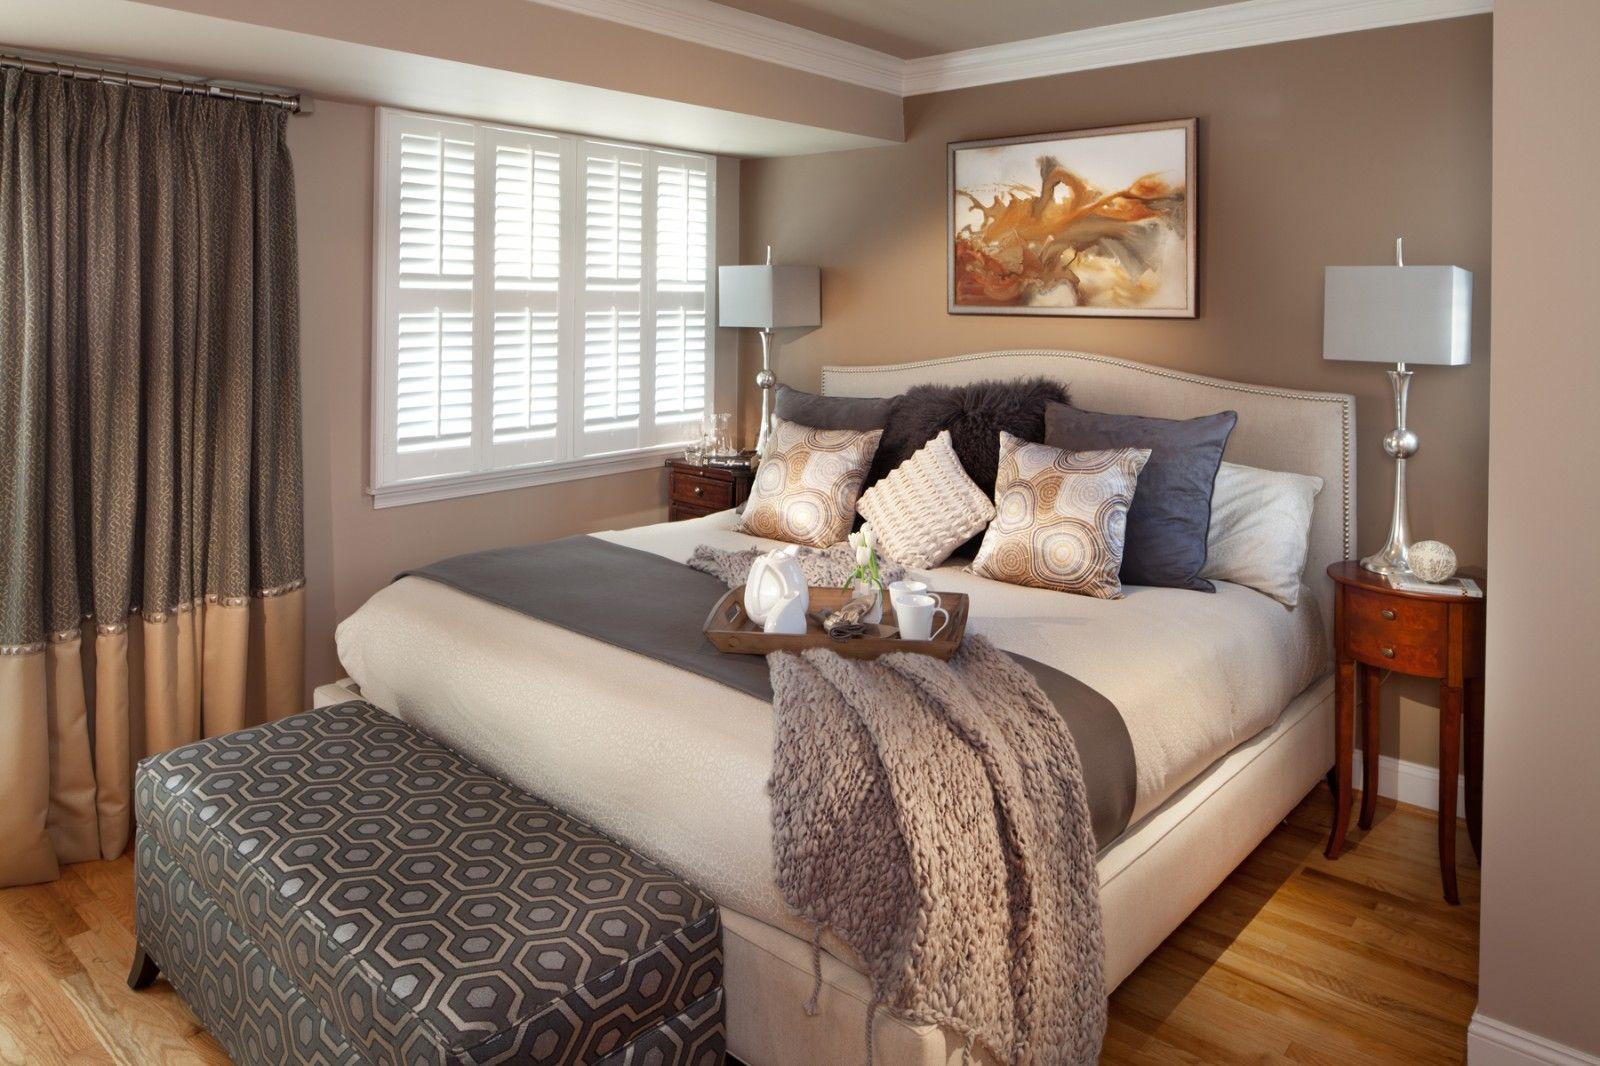 caramel grey bedroom - Google Search | Warm bedroom colors ...